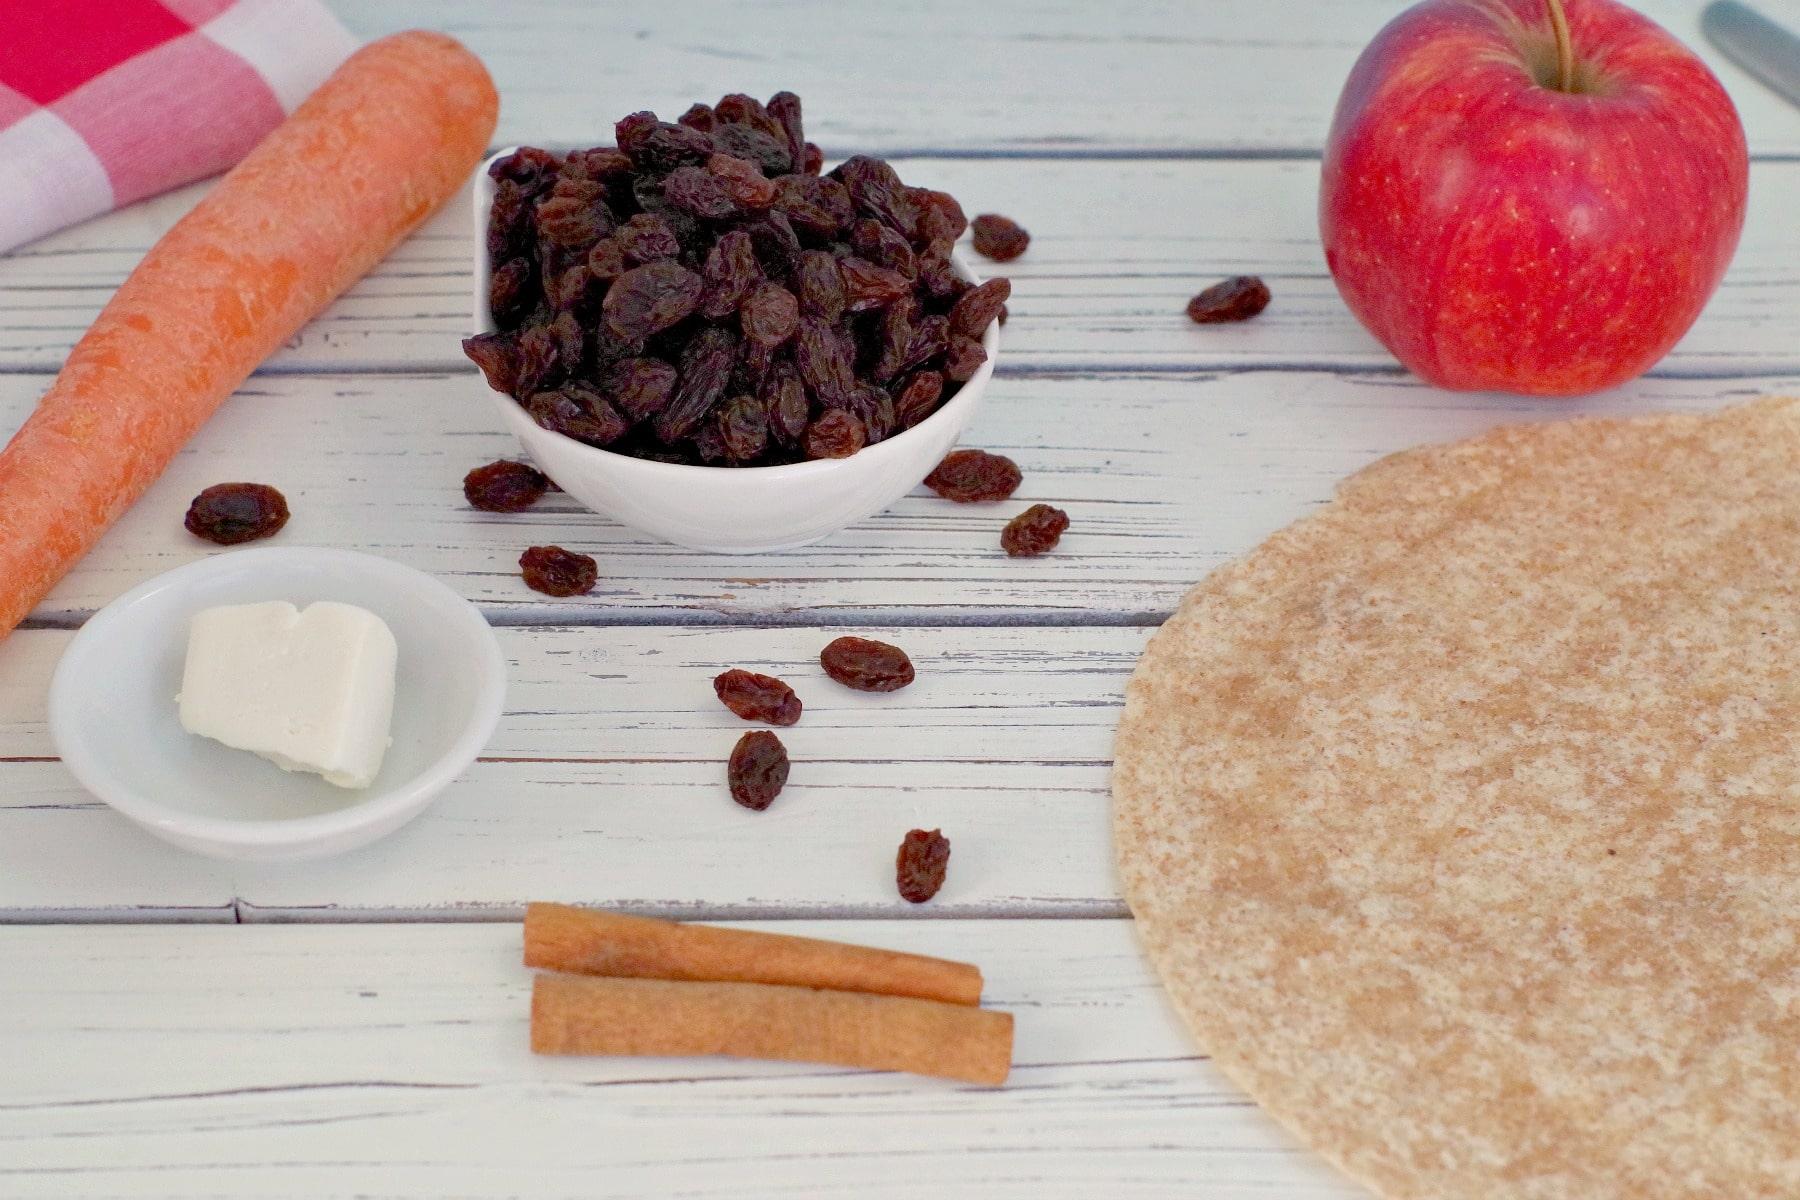 apple, raisins, cinnamon sticks, carrot, cream cheese and whole wheat tortillas